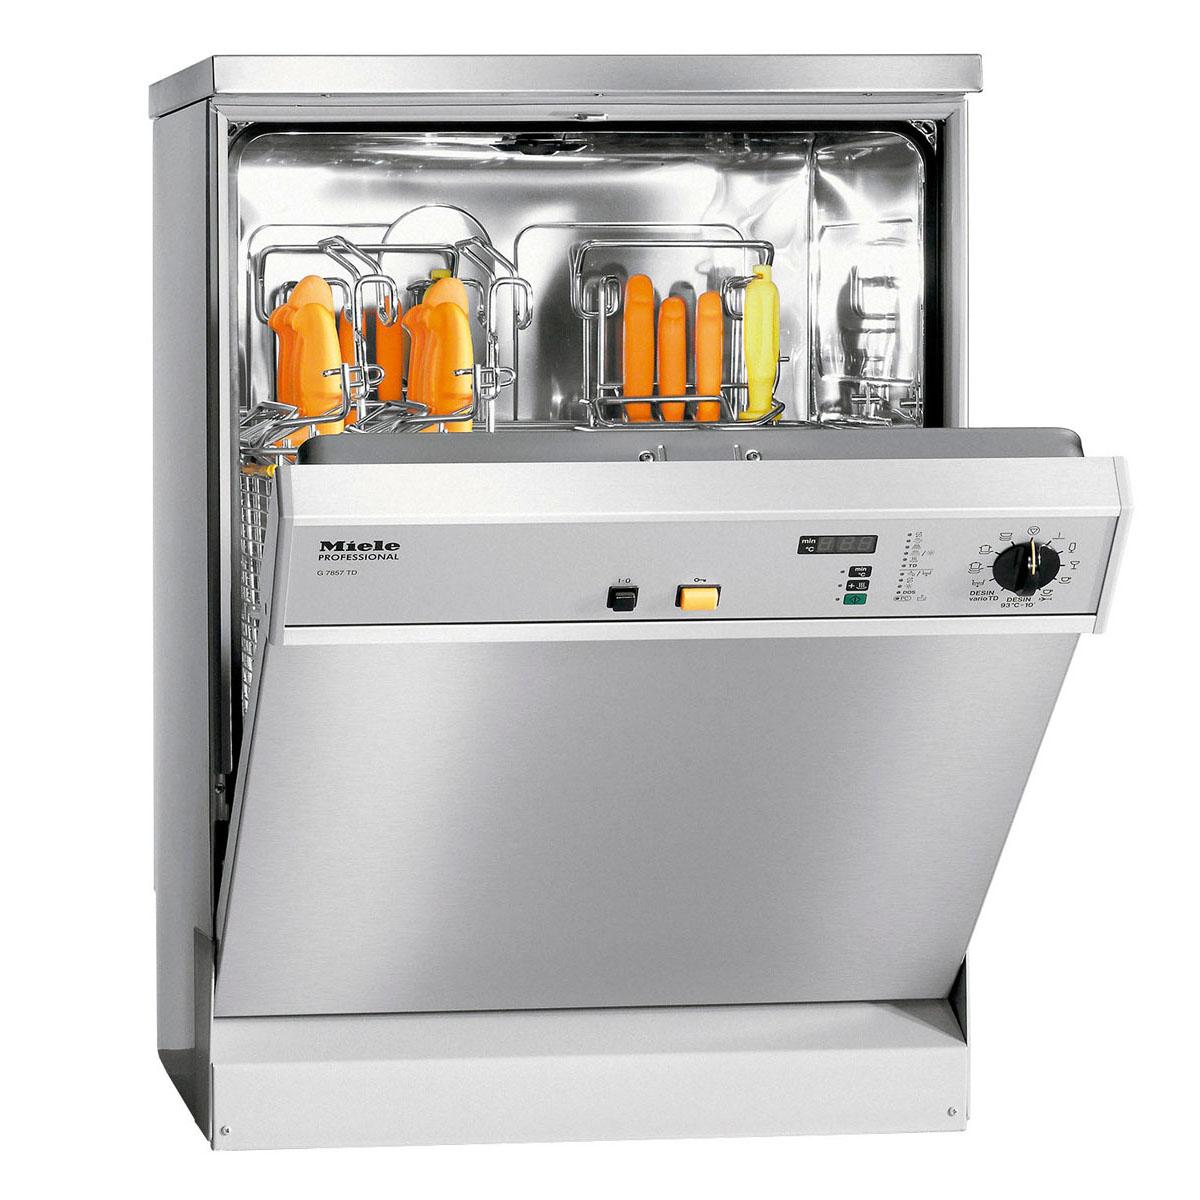 Messerkorb-Desinfektionsmaschine - Thermo-Desinfektor, ArtNr.: MKDM